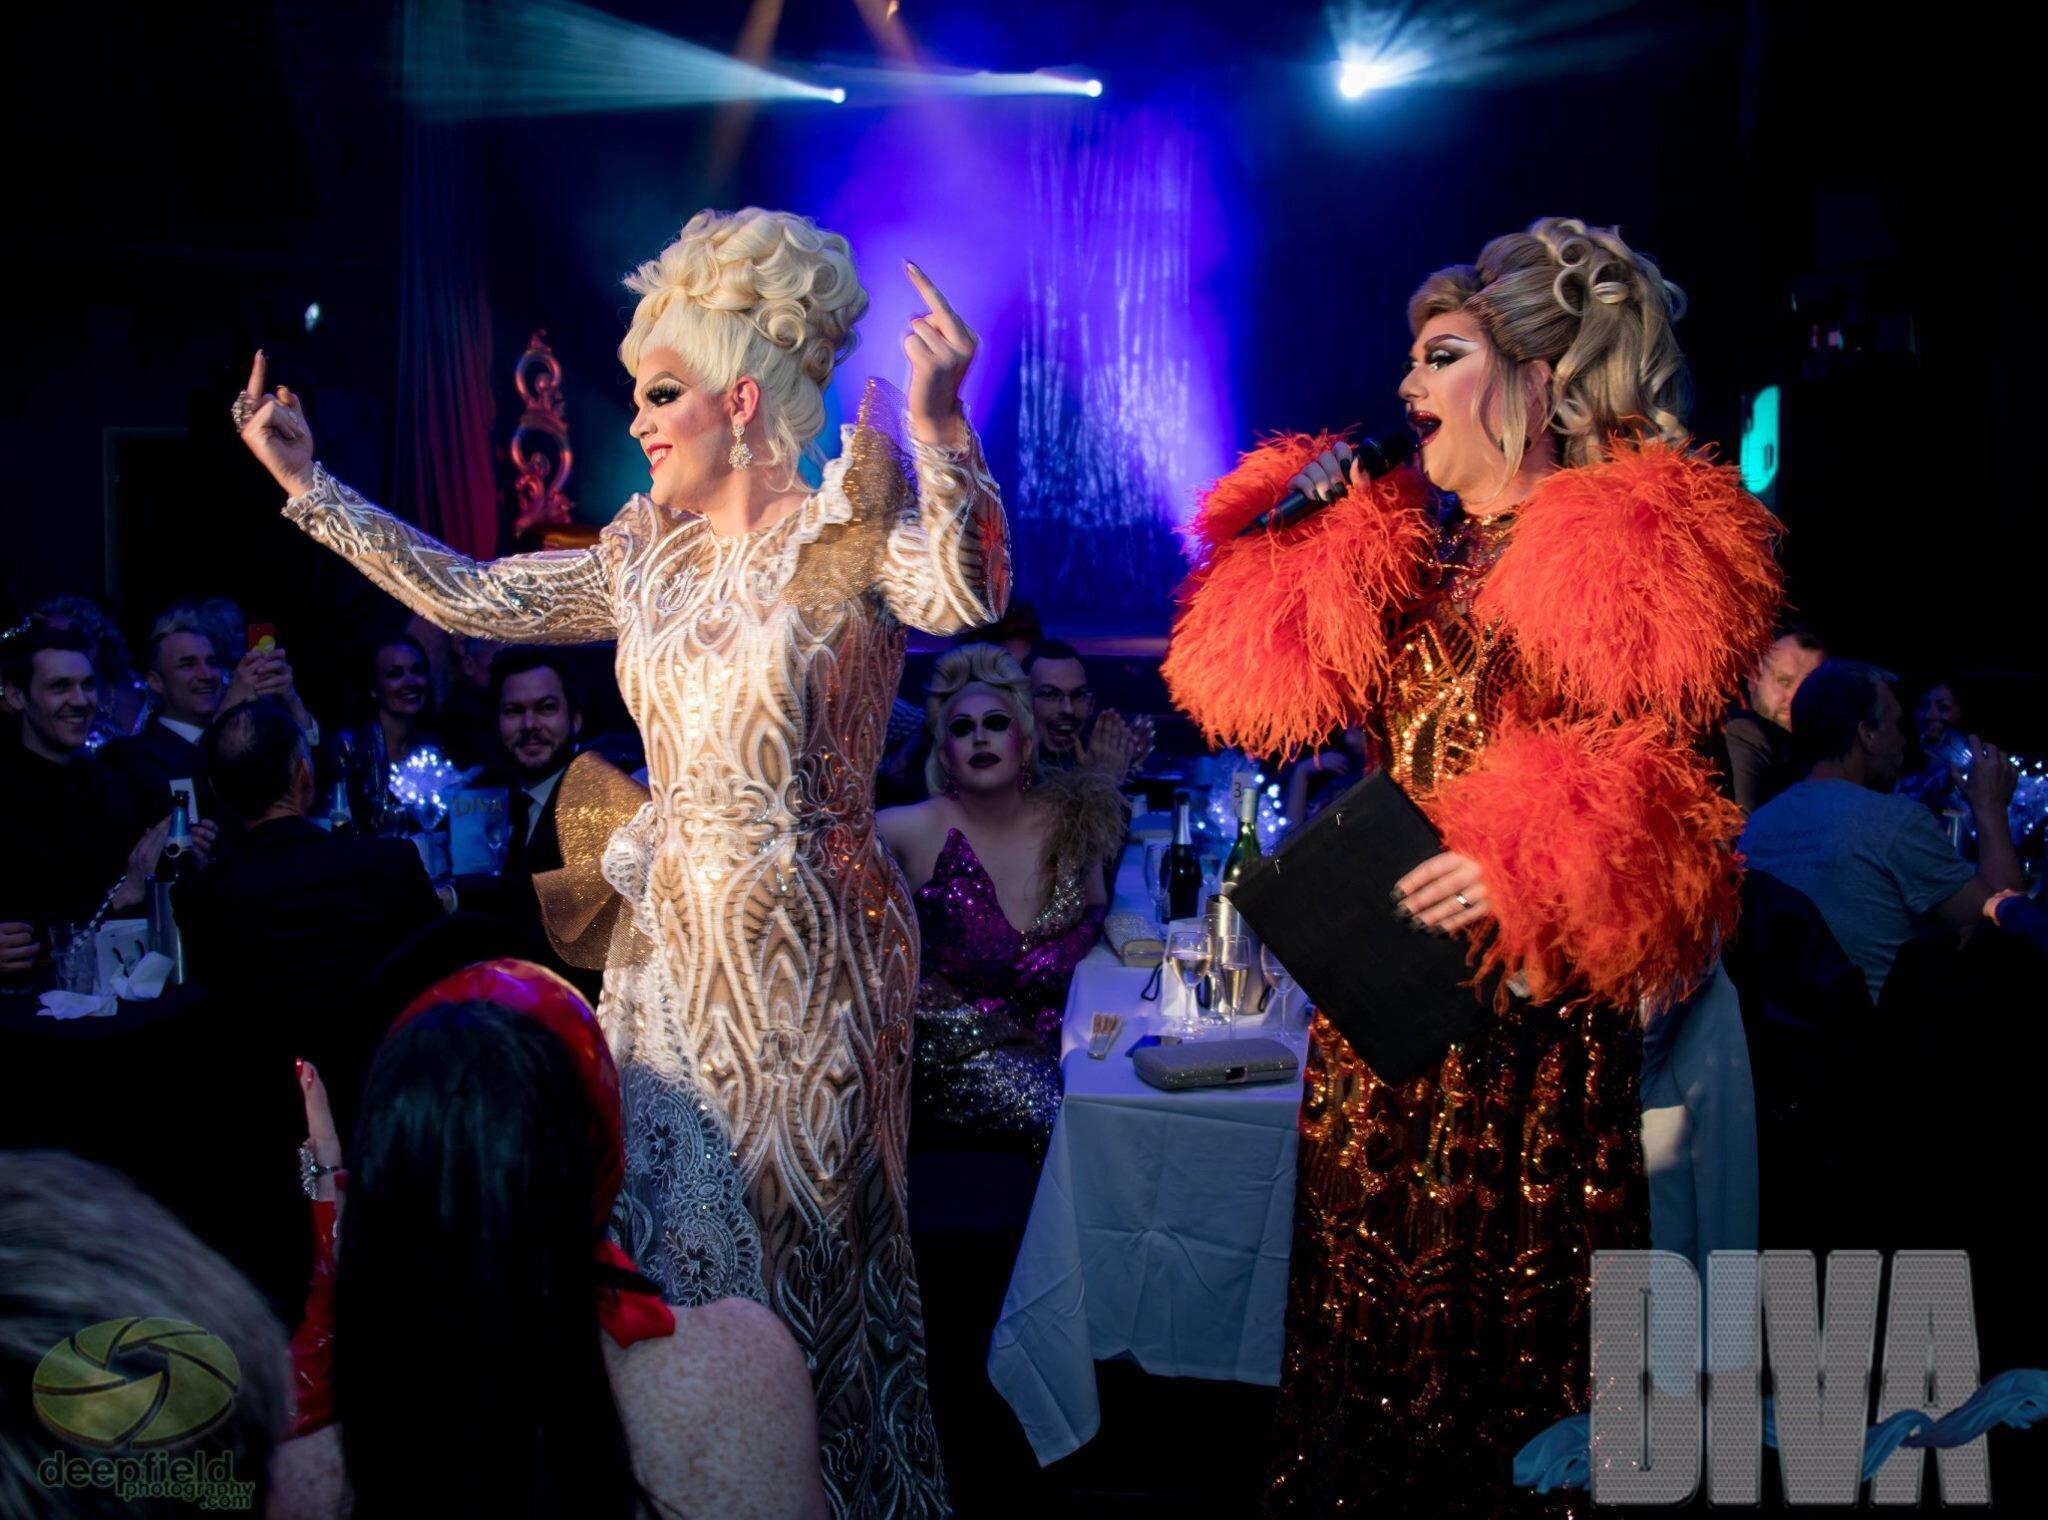 charisma-belle-corporate-host-event-hosting-carmen-geddit-diva-awards-sydney-drag-queen-royalty-best-hire-drag-race-australia.jpg